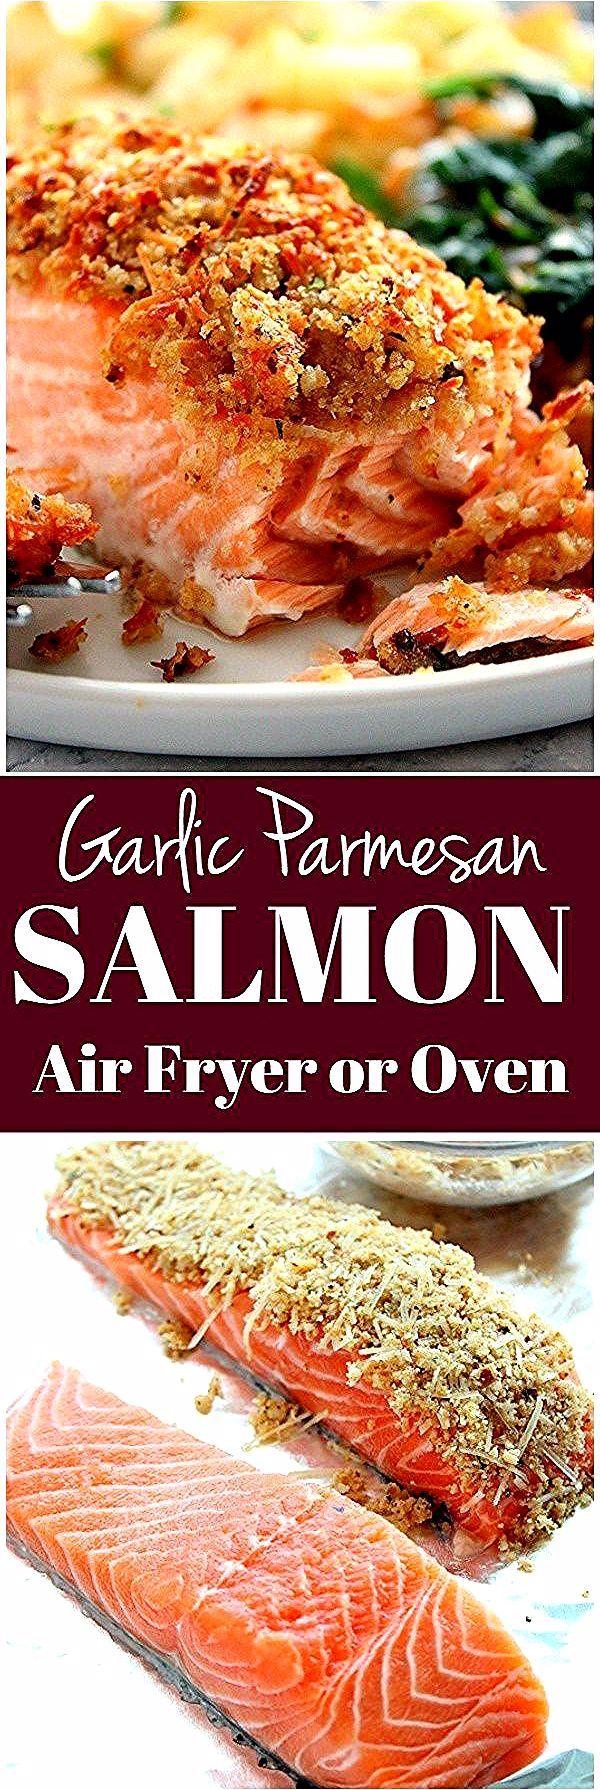 Garlic Parmesan Crusted Salmon Recipe (Oven and Air Fryer version) #garlicparmesanshrimp